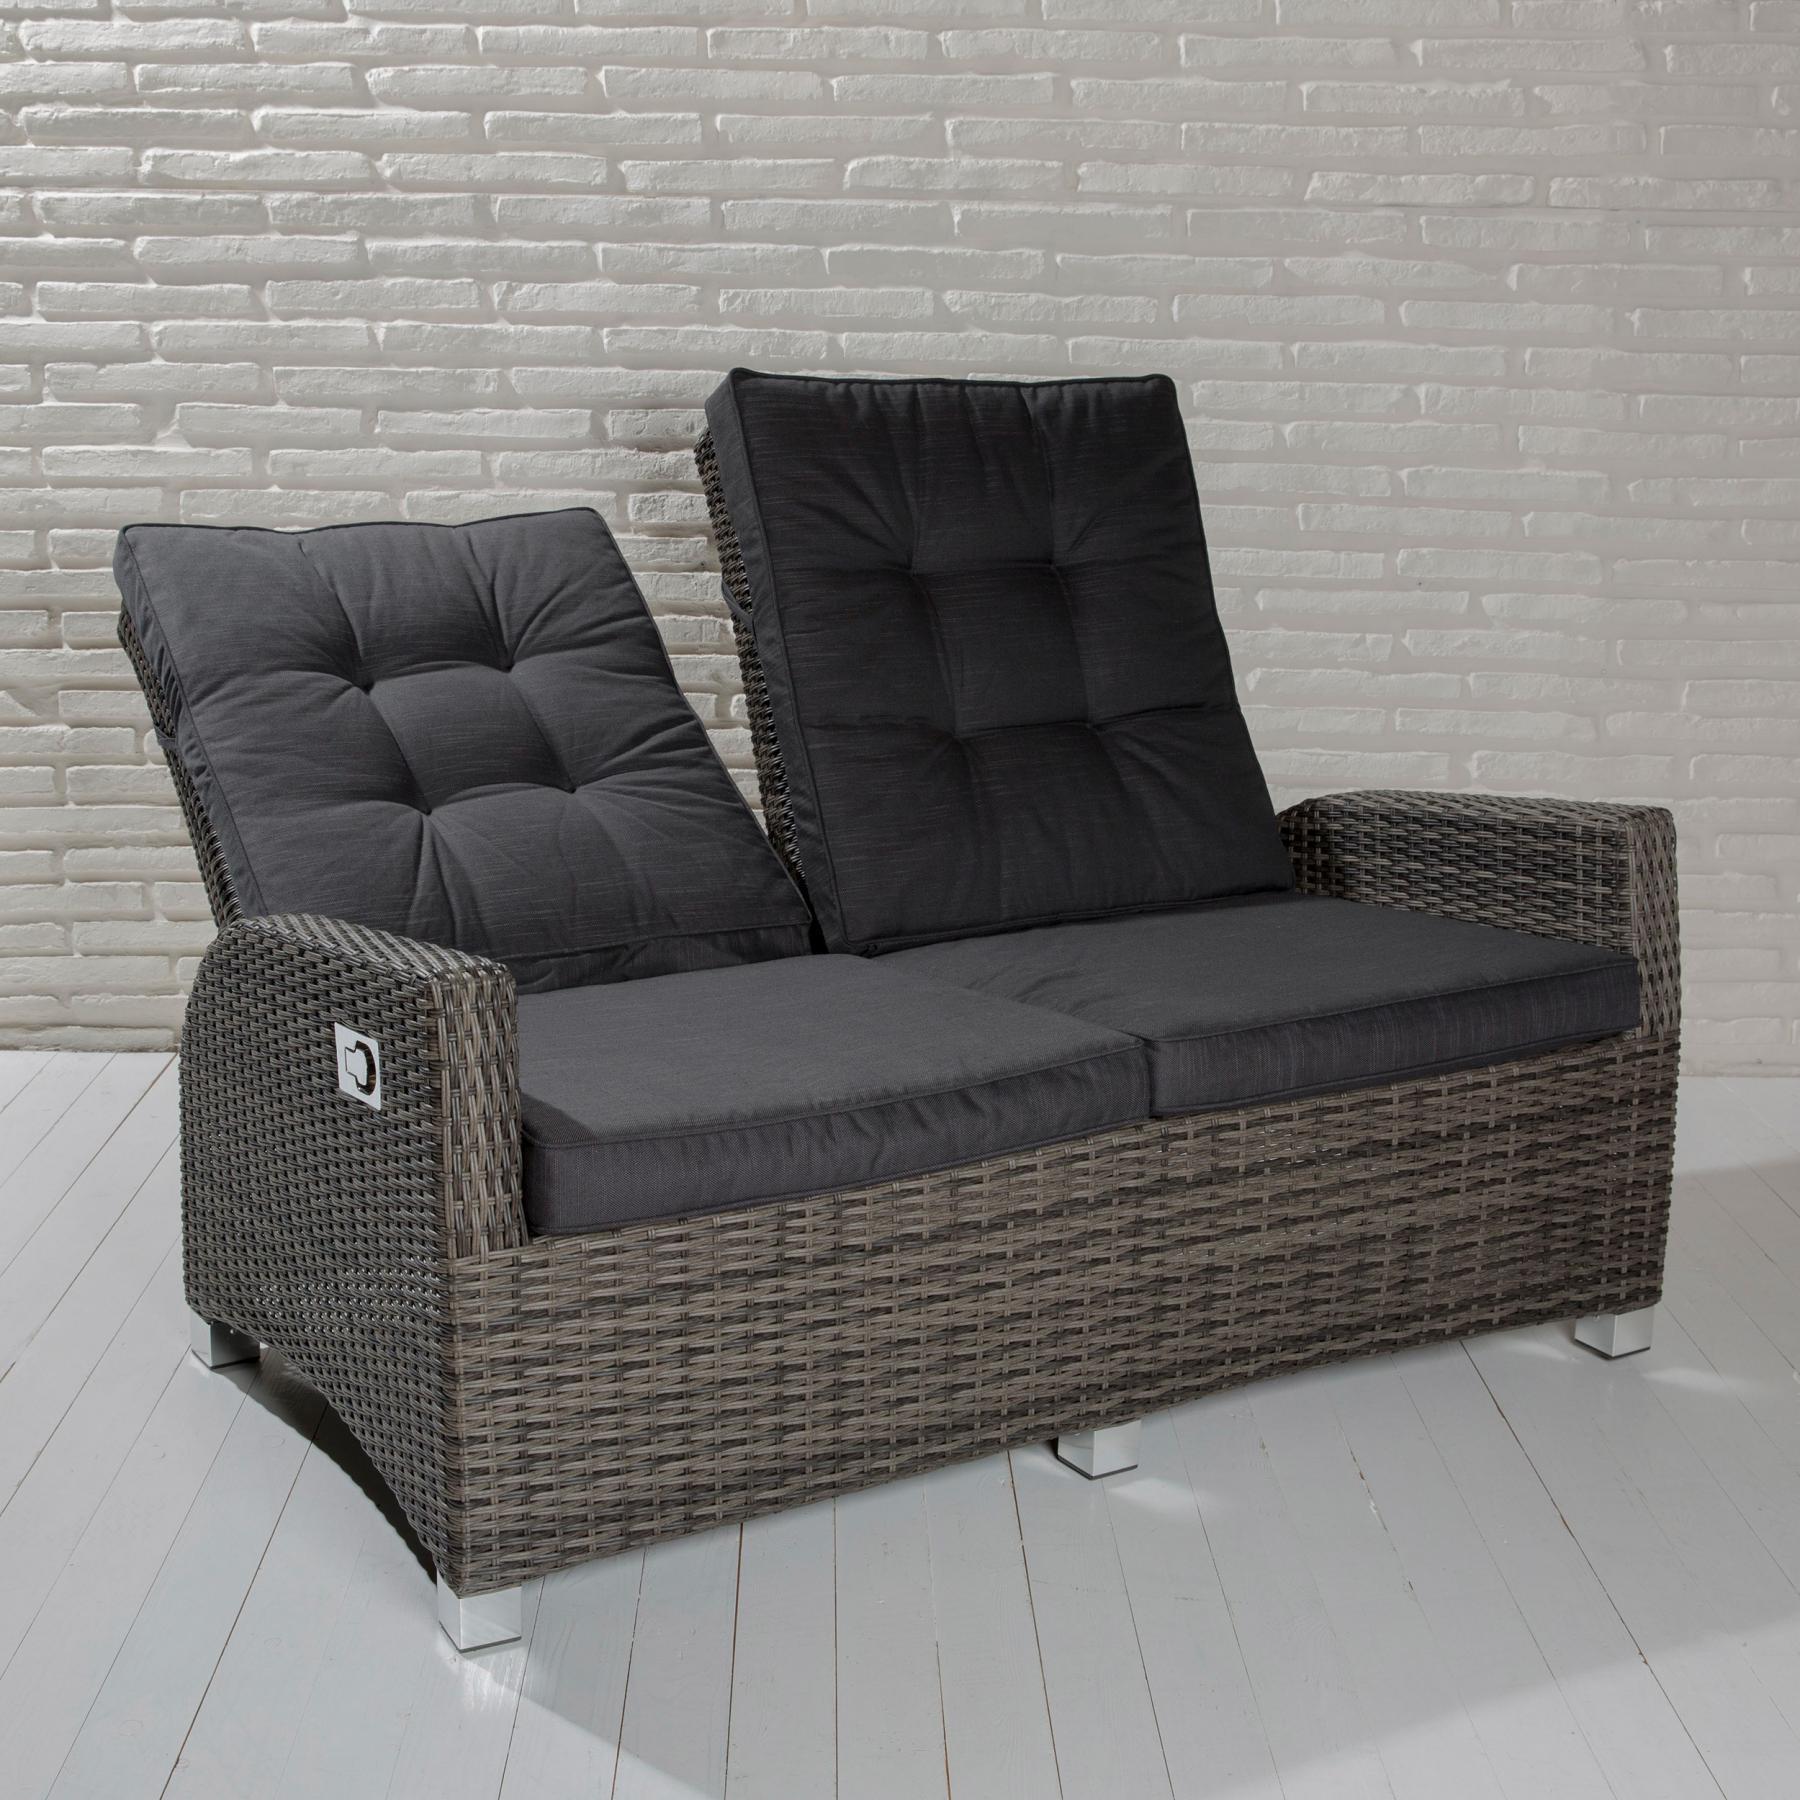 2 sitzer gartensofa barcelona grau mix loungesofa sofa gartenm bel living sofa polyrattan. Black Bedroom Furniture Sets. Home Design Ideas